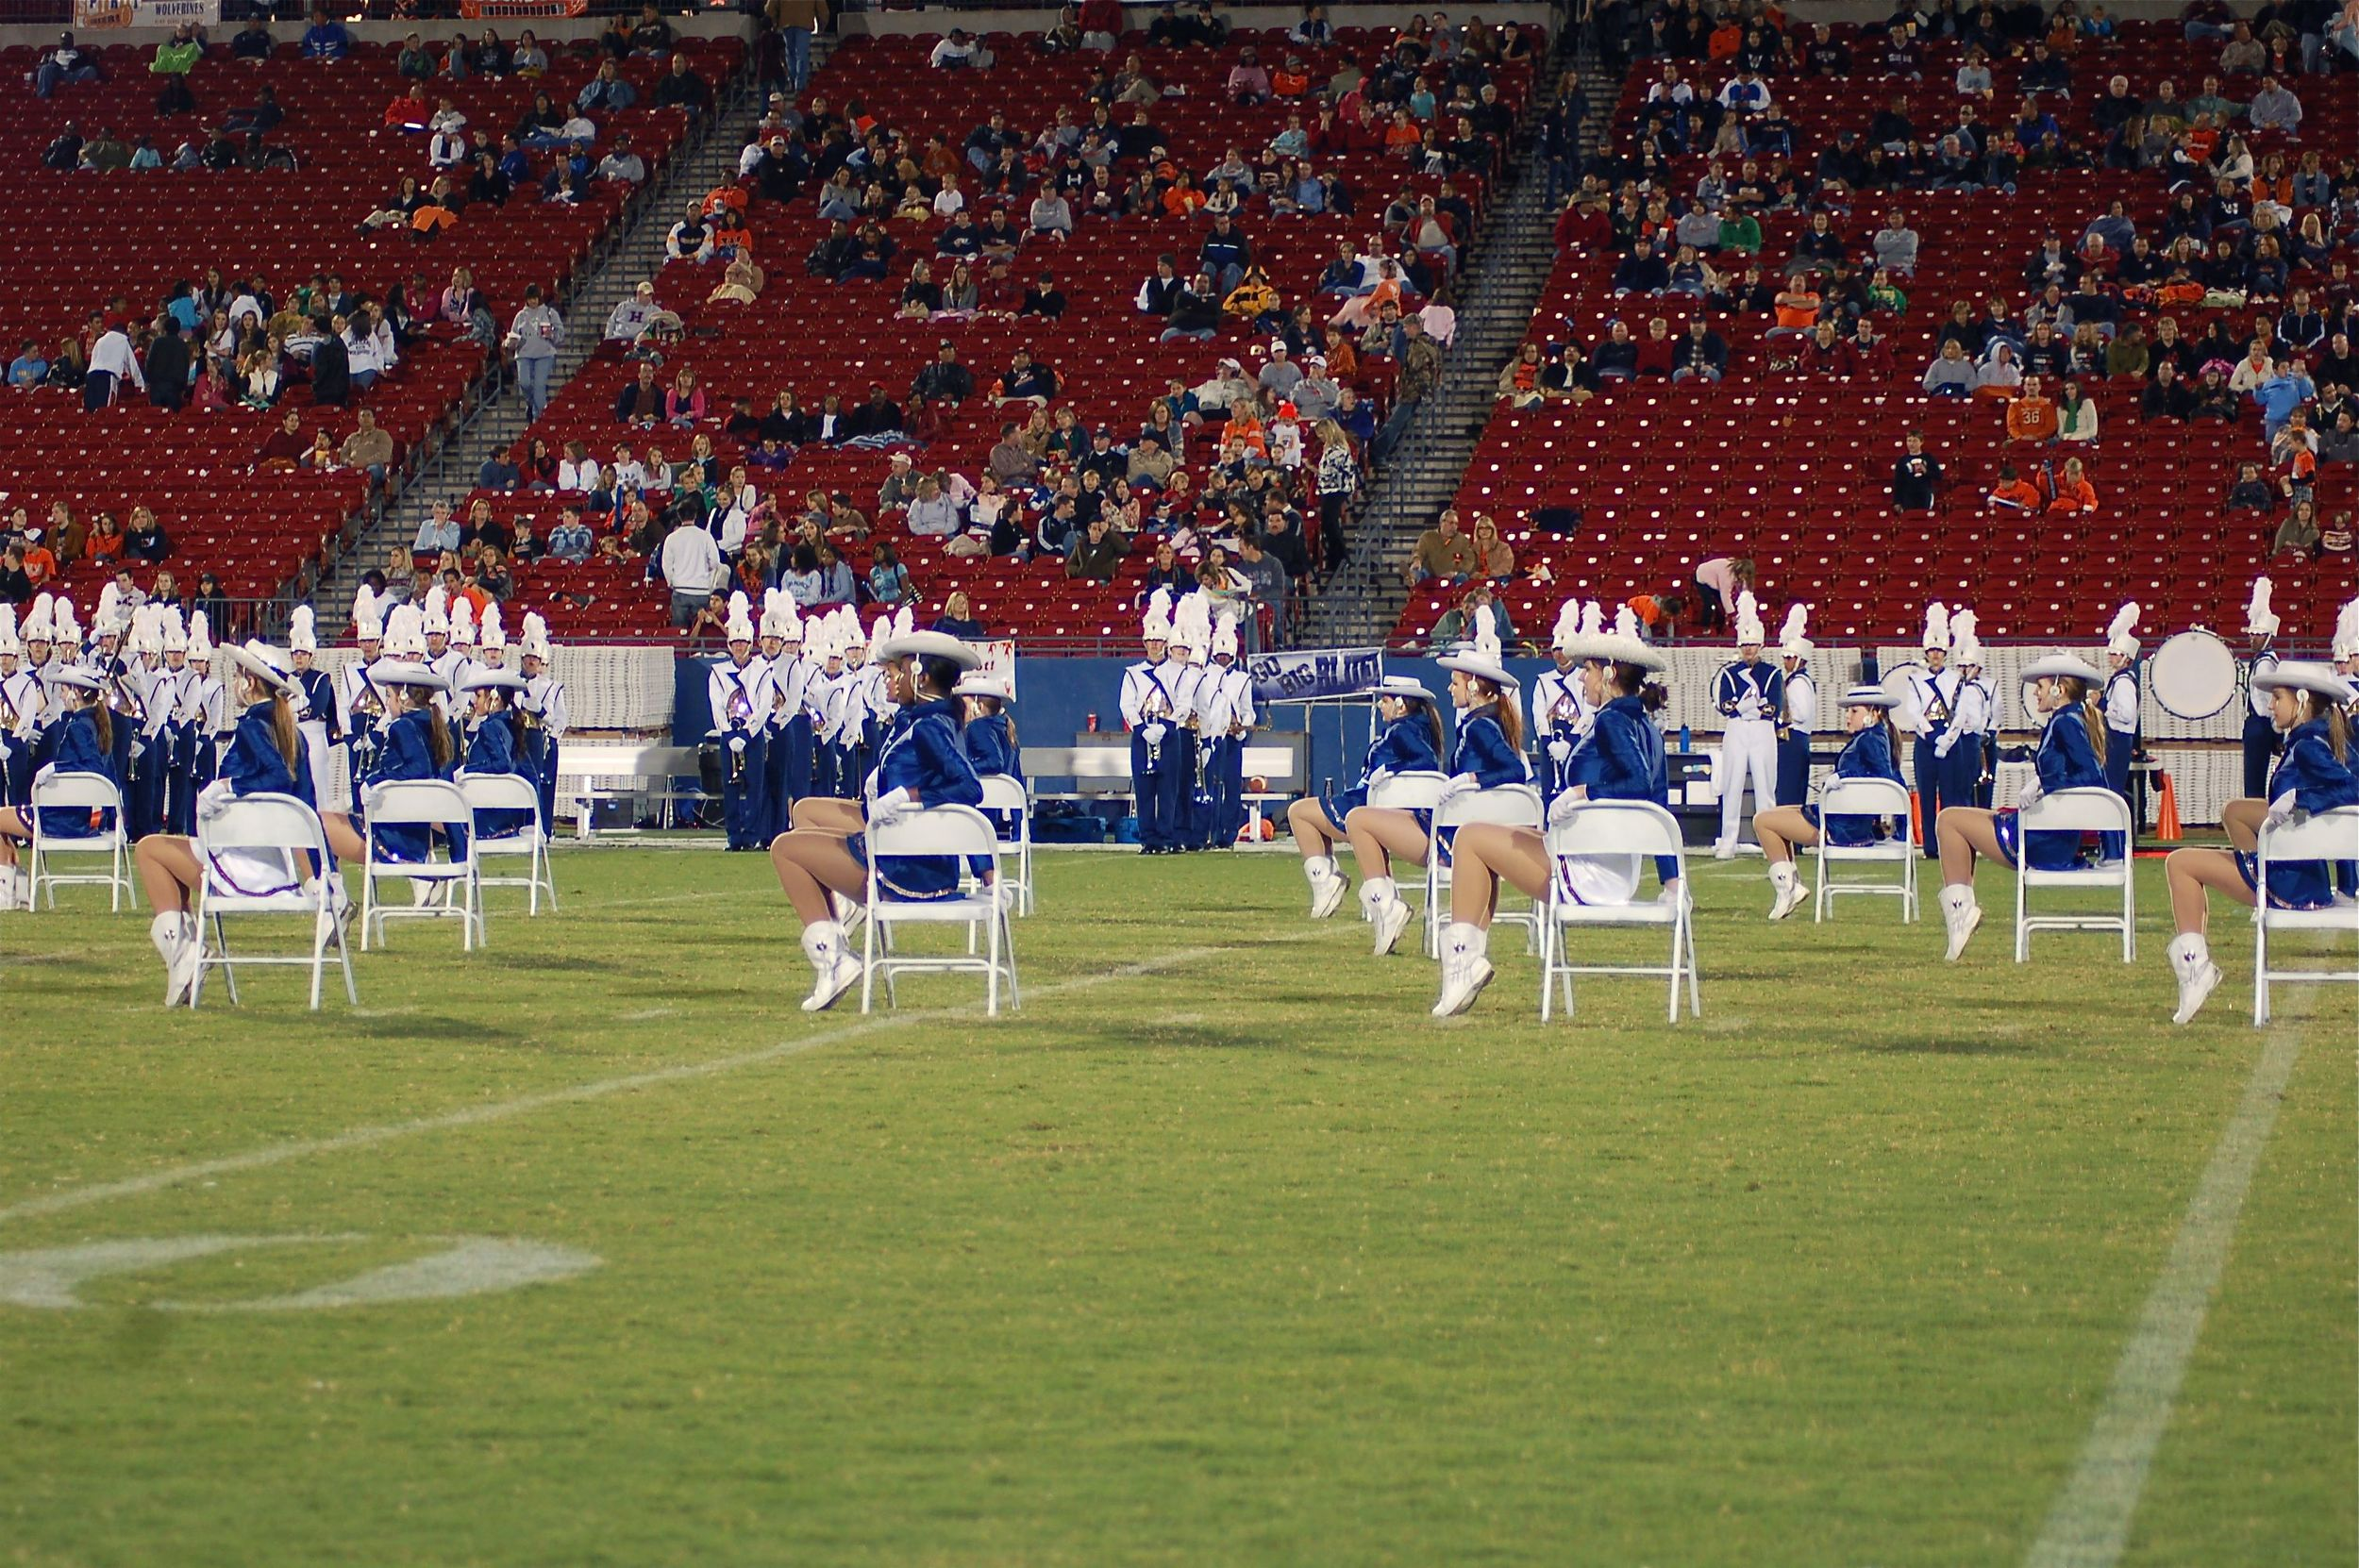 WHSLL Frisco Game 10-24-2008 - 19.jpg